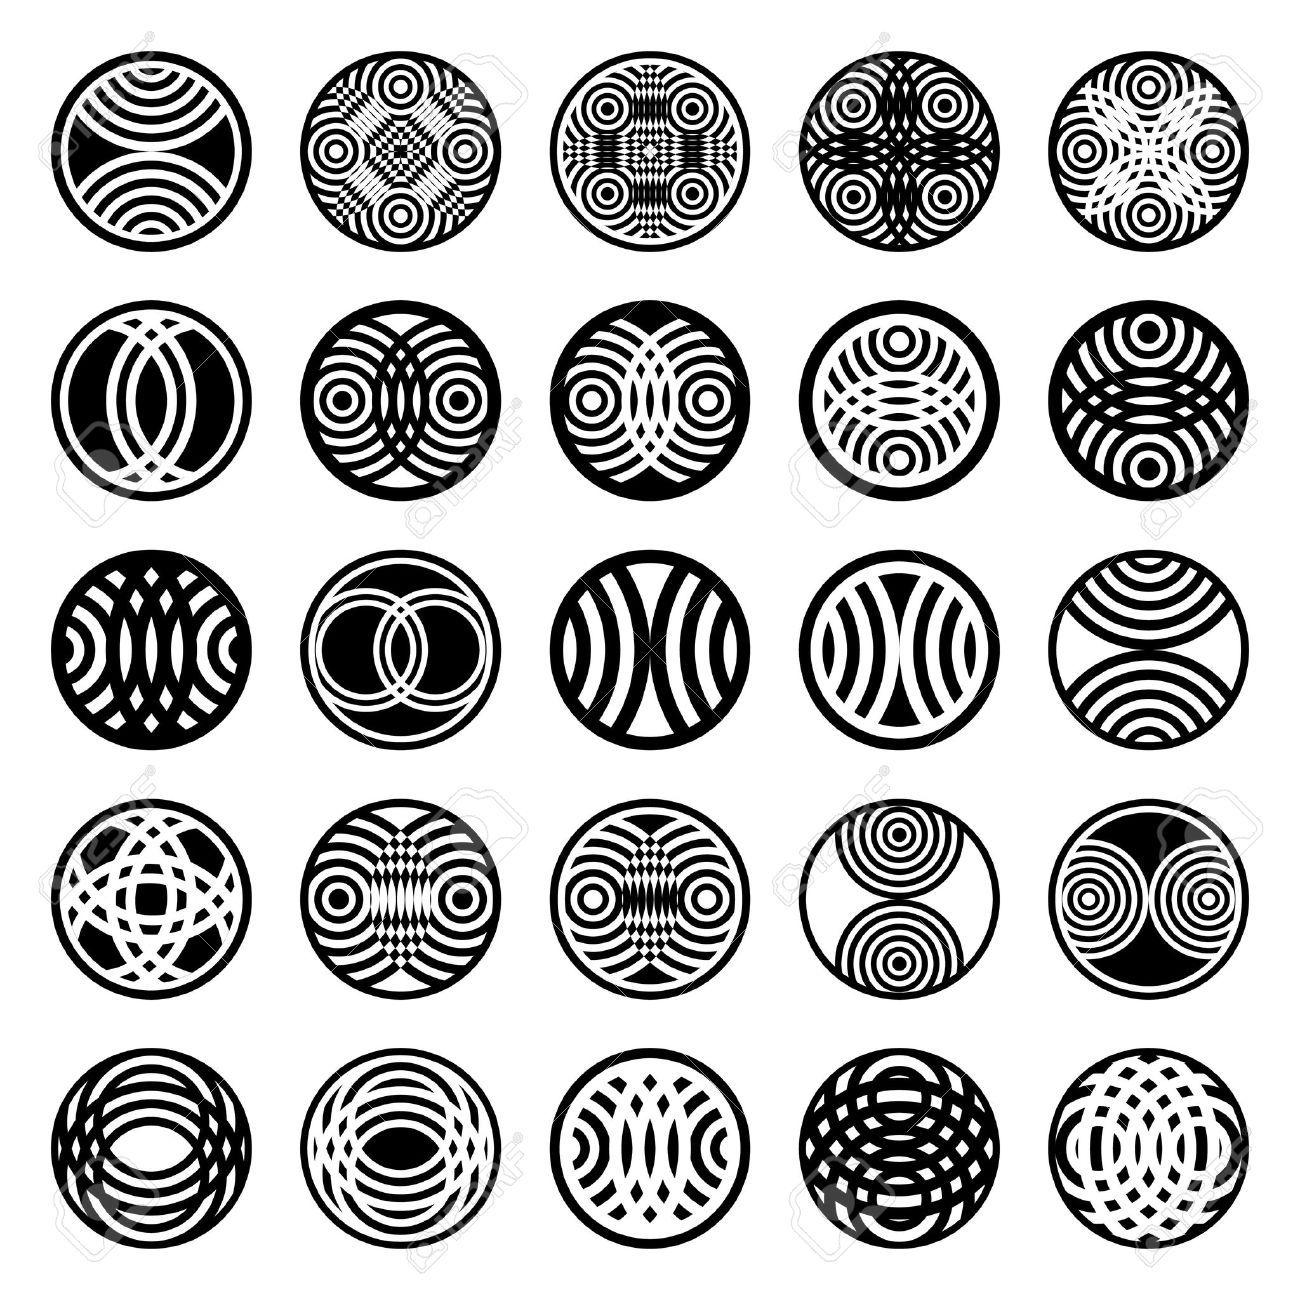 Patterns In Circle Shape 25 Design Elements Set 1